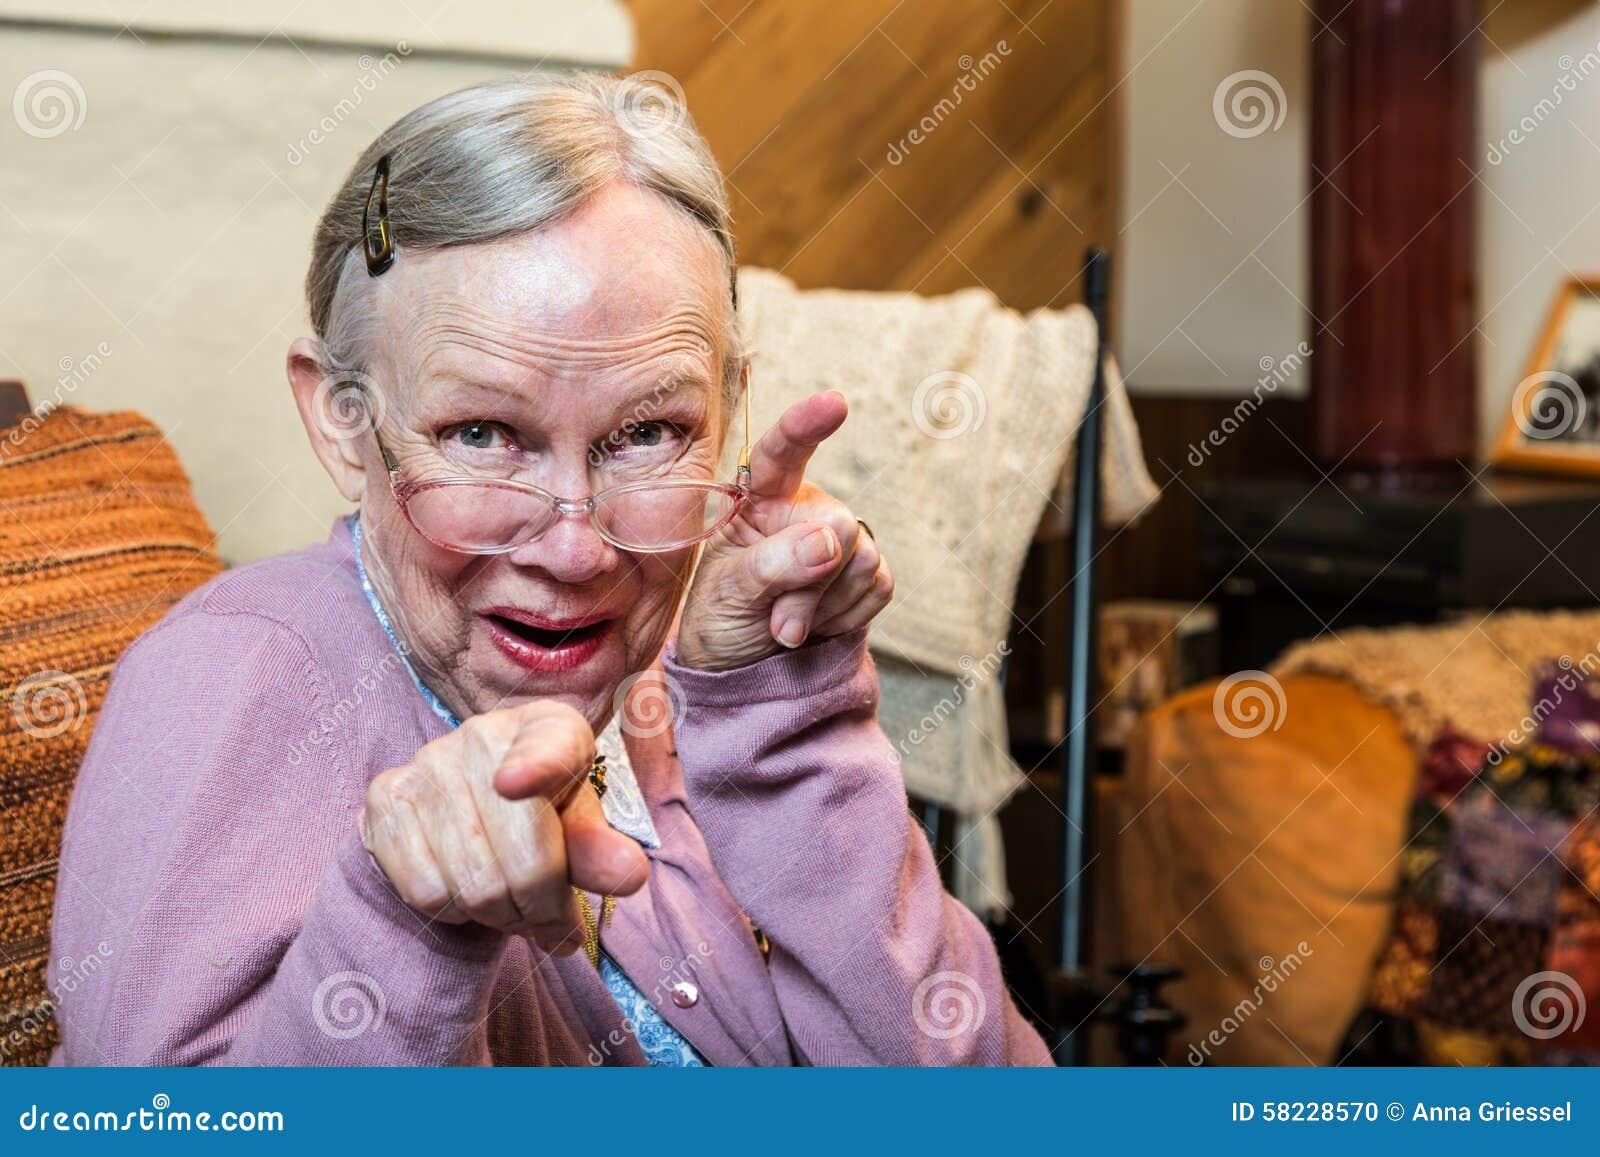 amusing nice living room stock photography image 18909472   Old Woman In Living Room Dancing Stock Photo - Image of ...